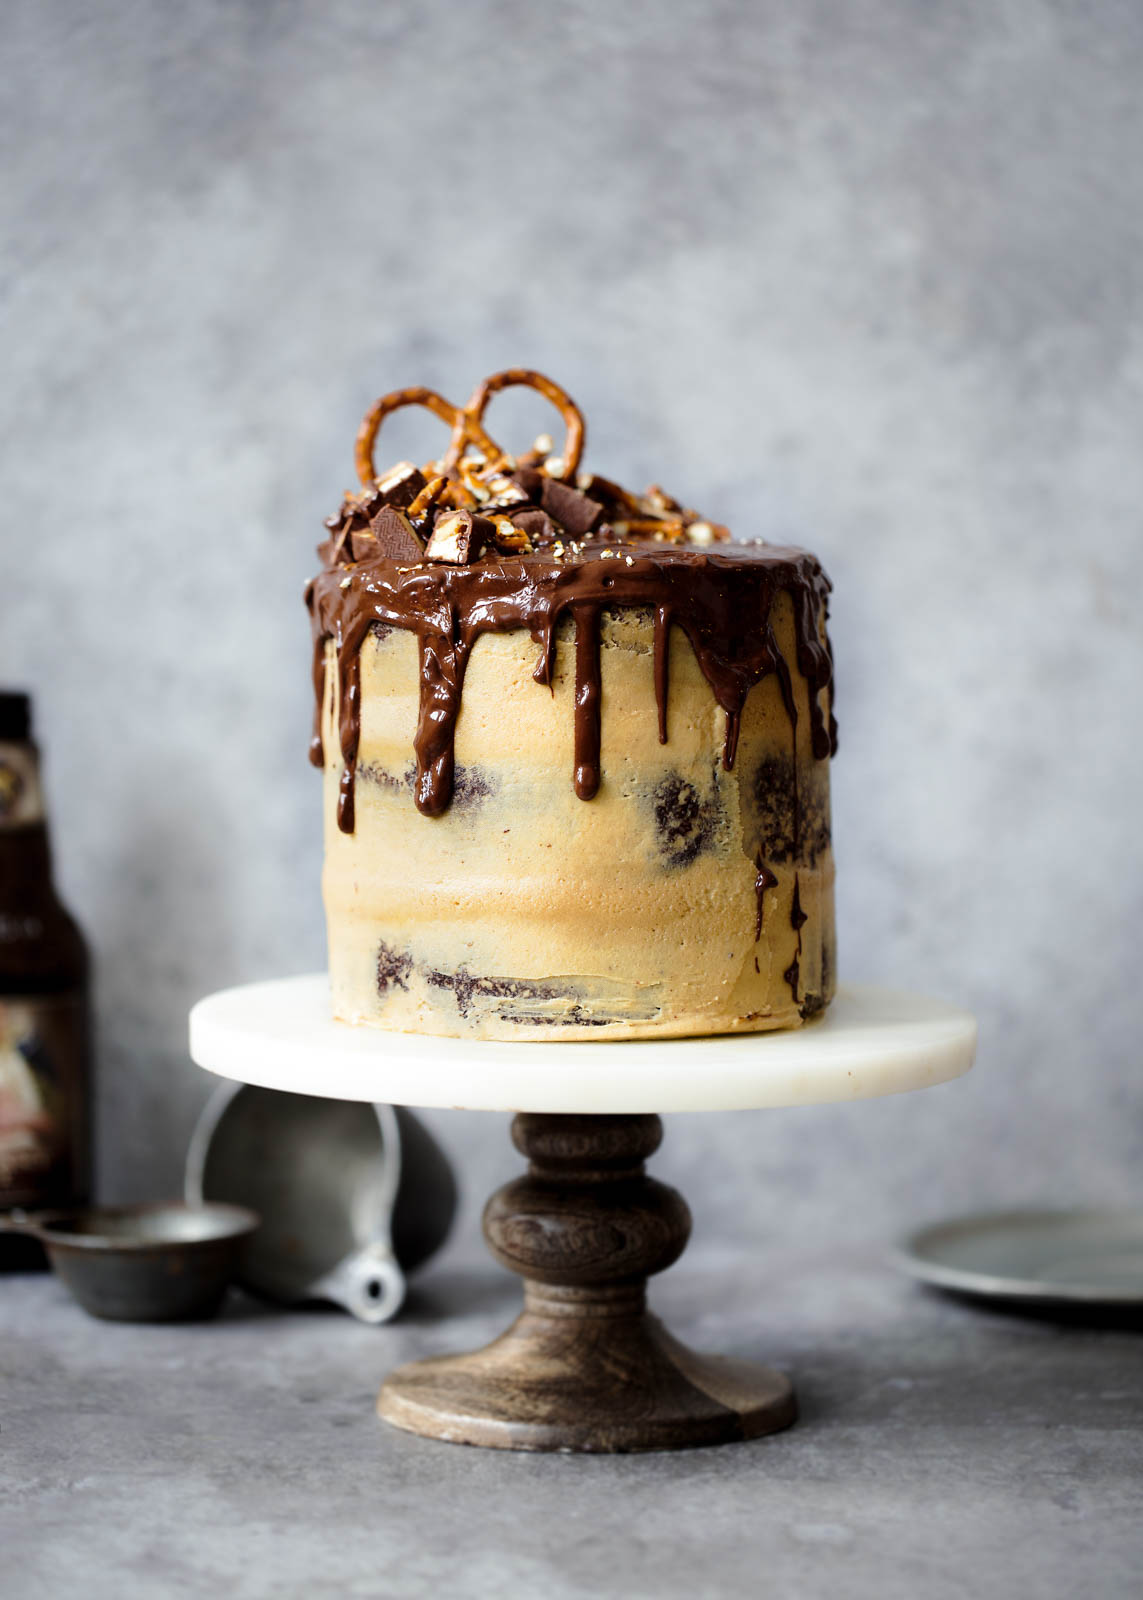 Peanut Butter Chocolate Stout Cake